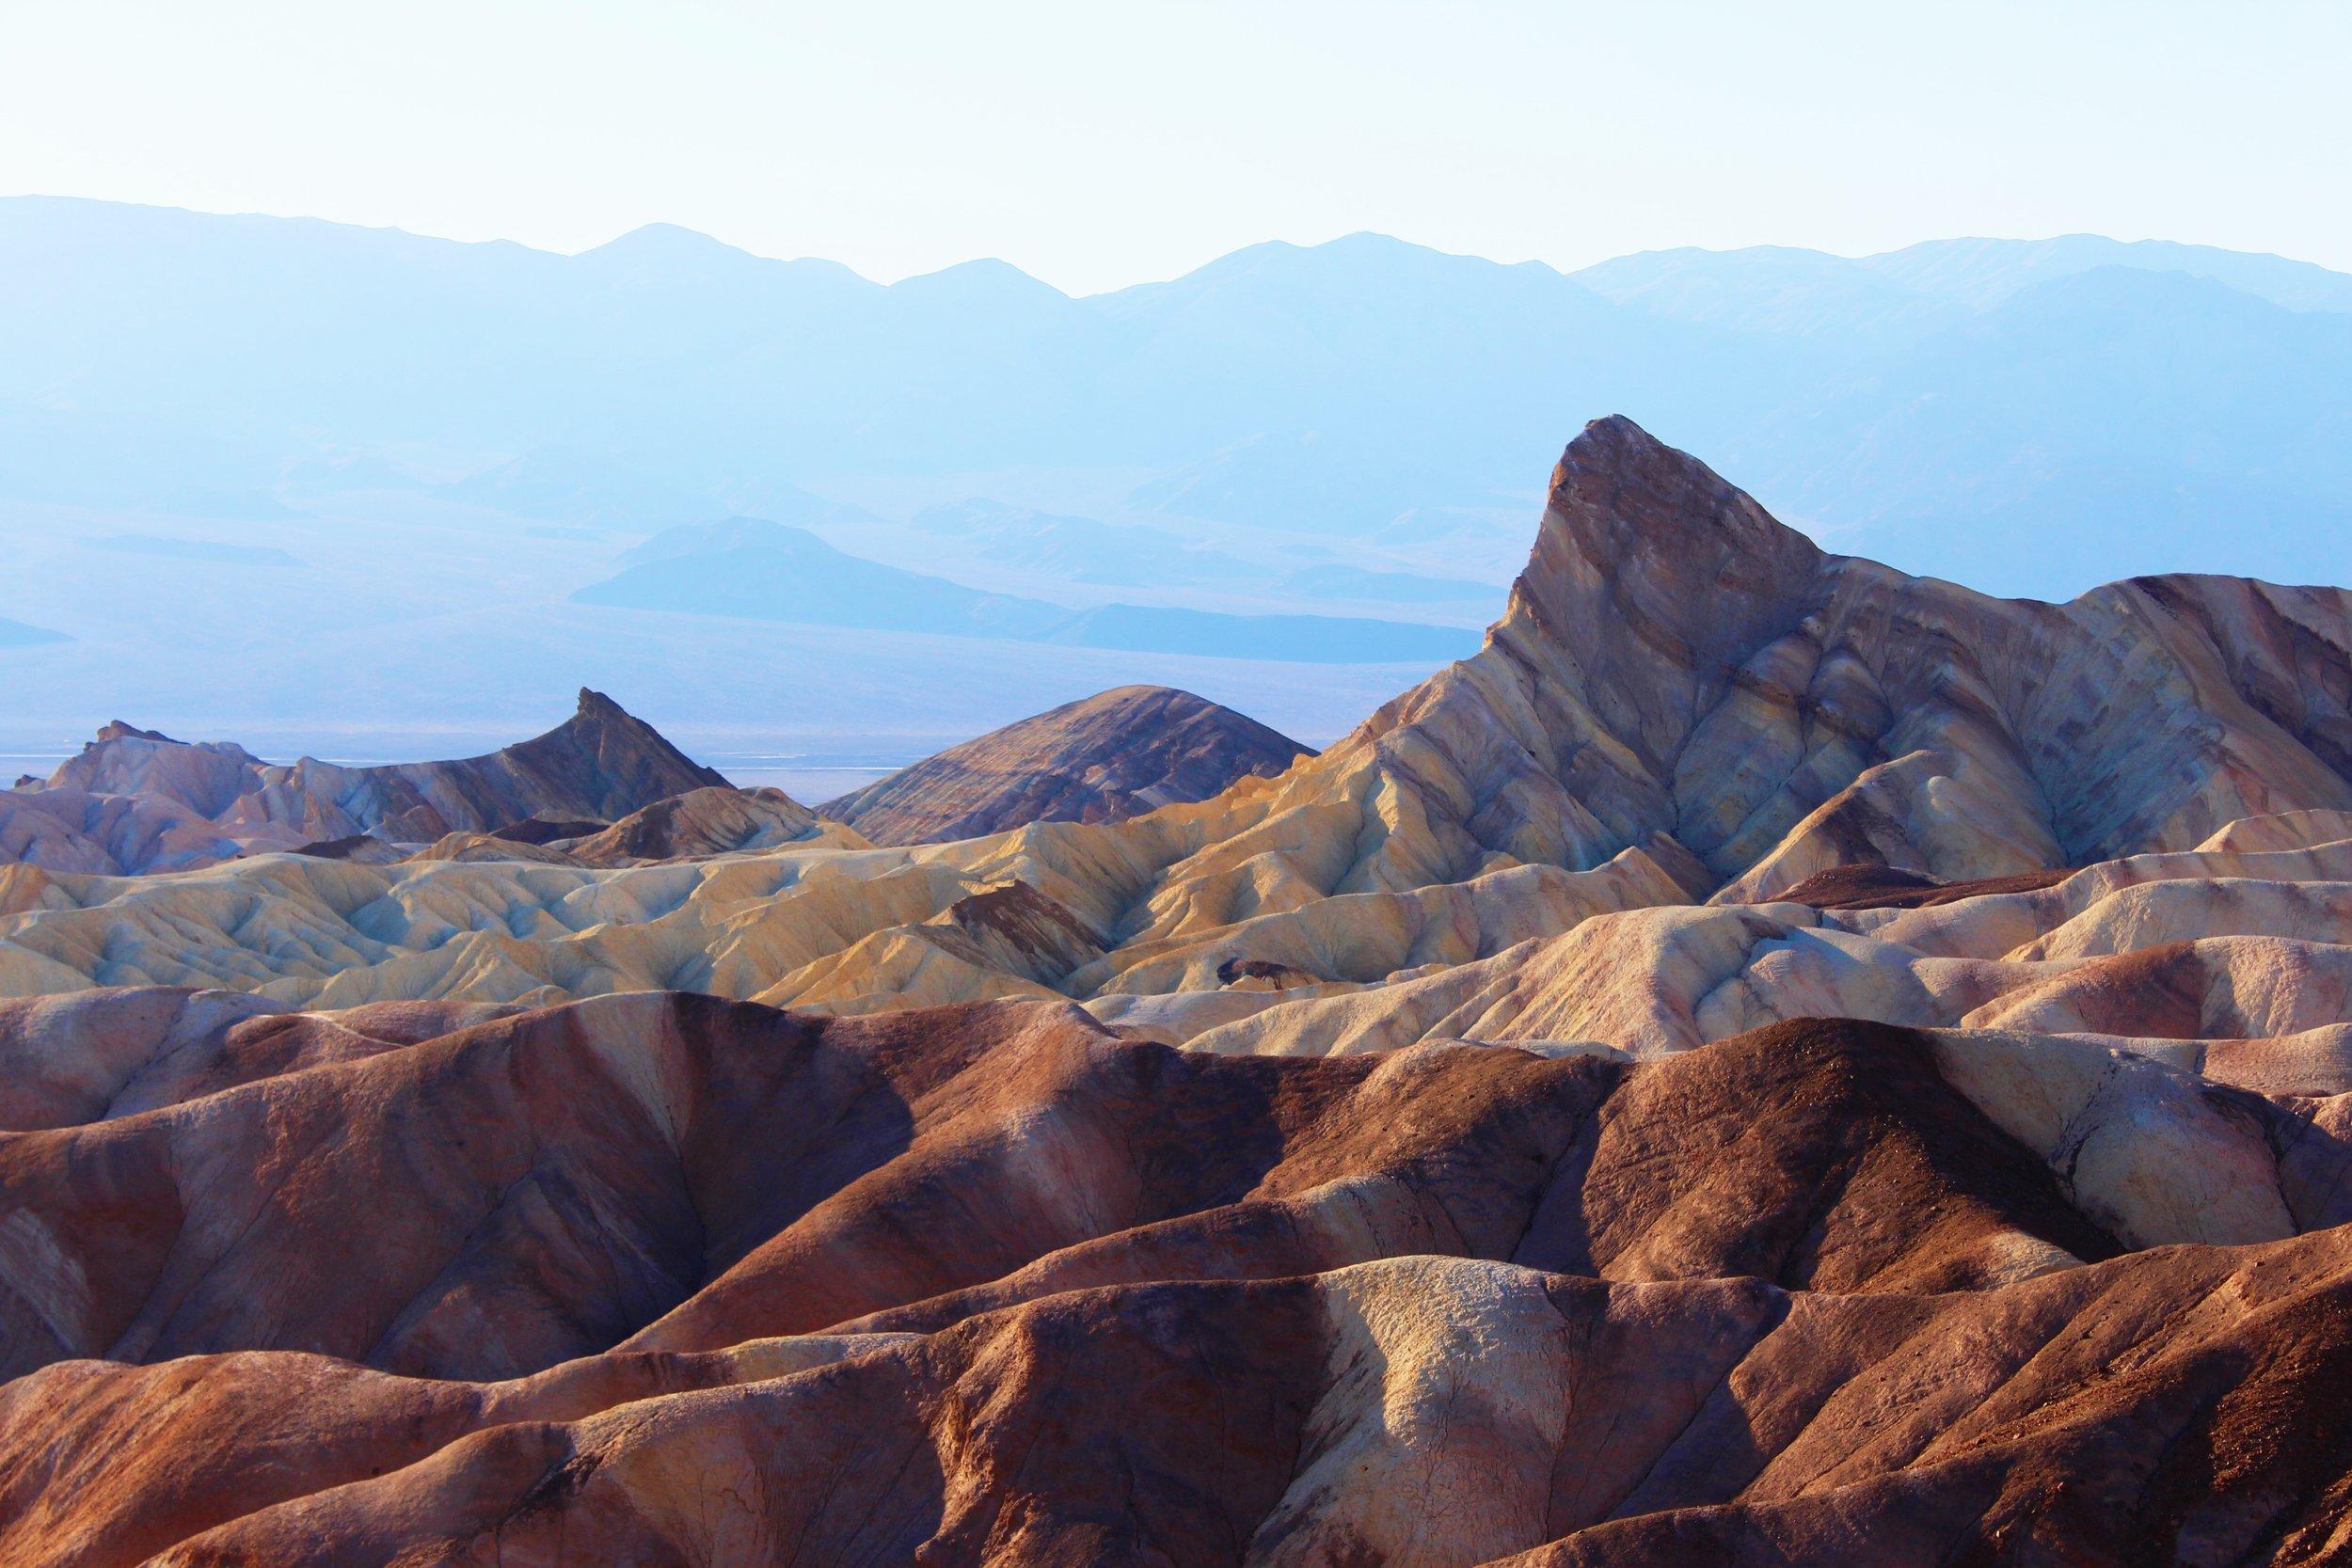 barren-canyon-daylight-226366.jpg